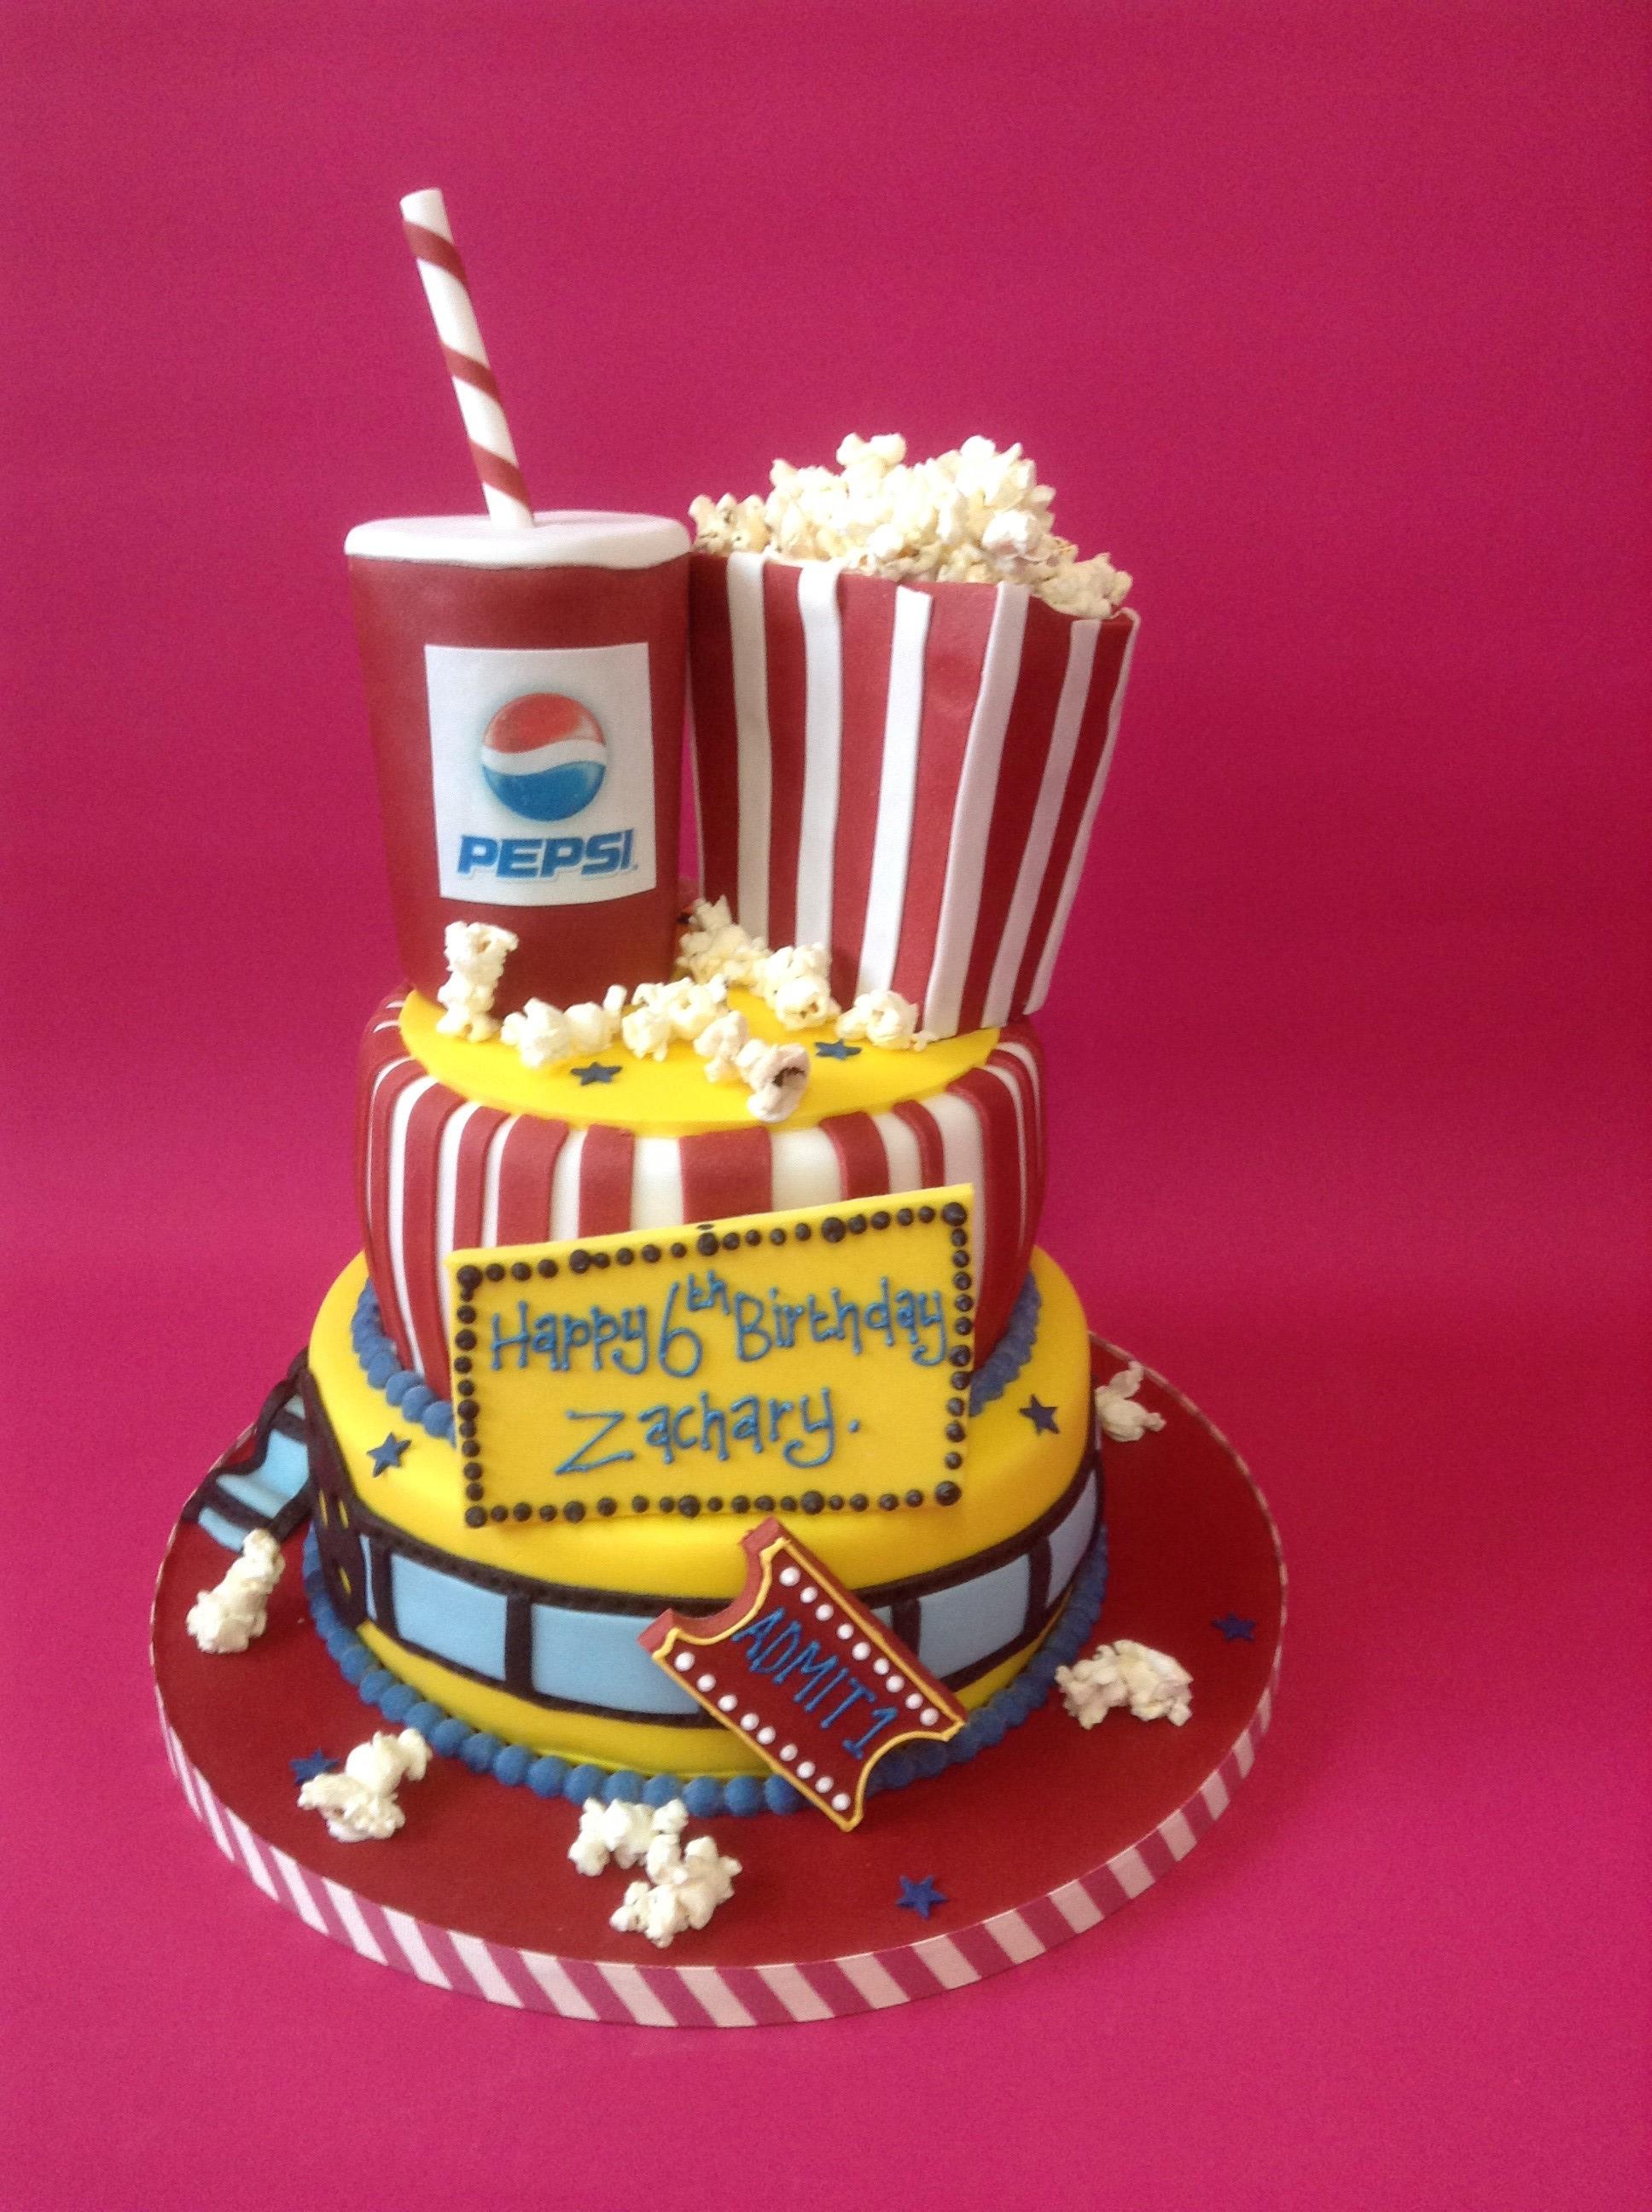 enlarge - Decorative Cakes